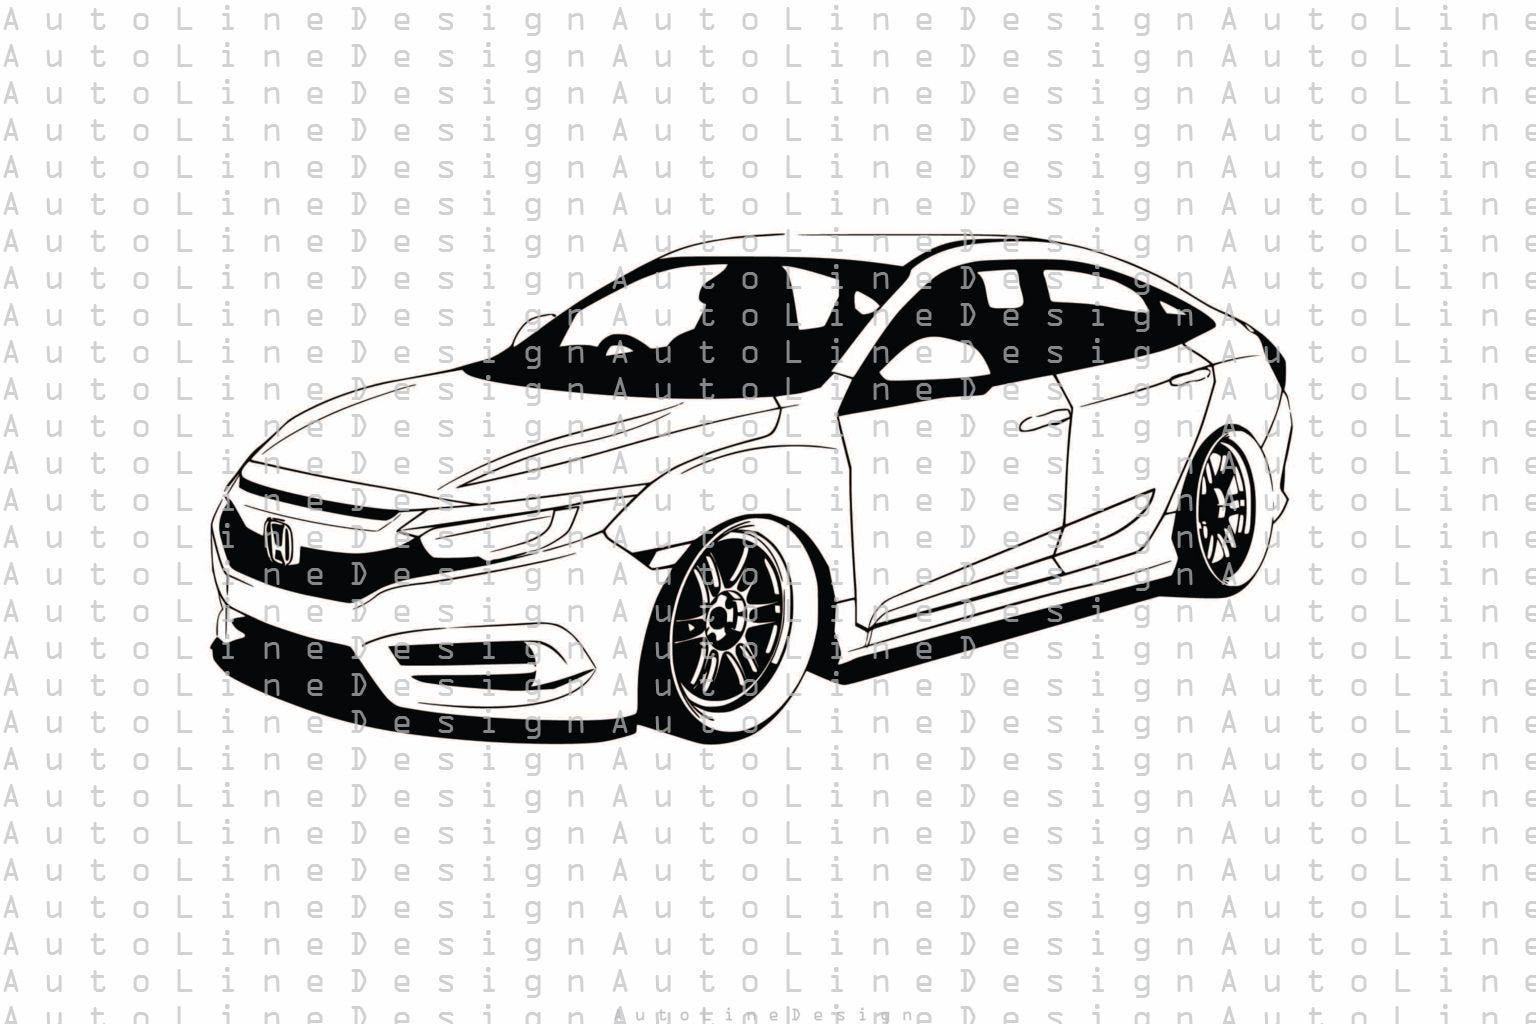 Honda Civic Gen 10 Tuning Low Rider Stance Jdm Svg Pdf Dxf Eps Etsy In 2021 Honda Civic Honda Civic